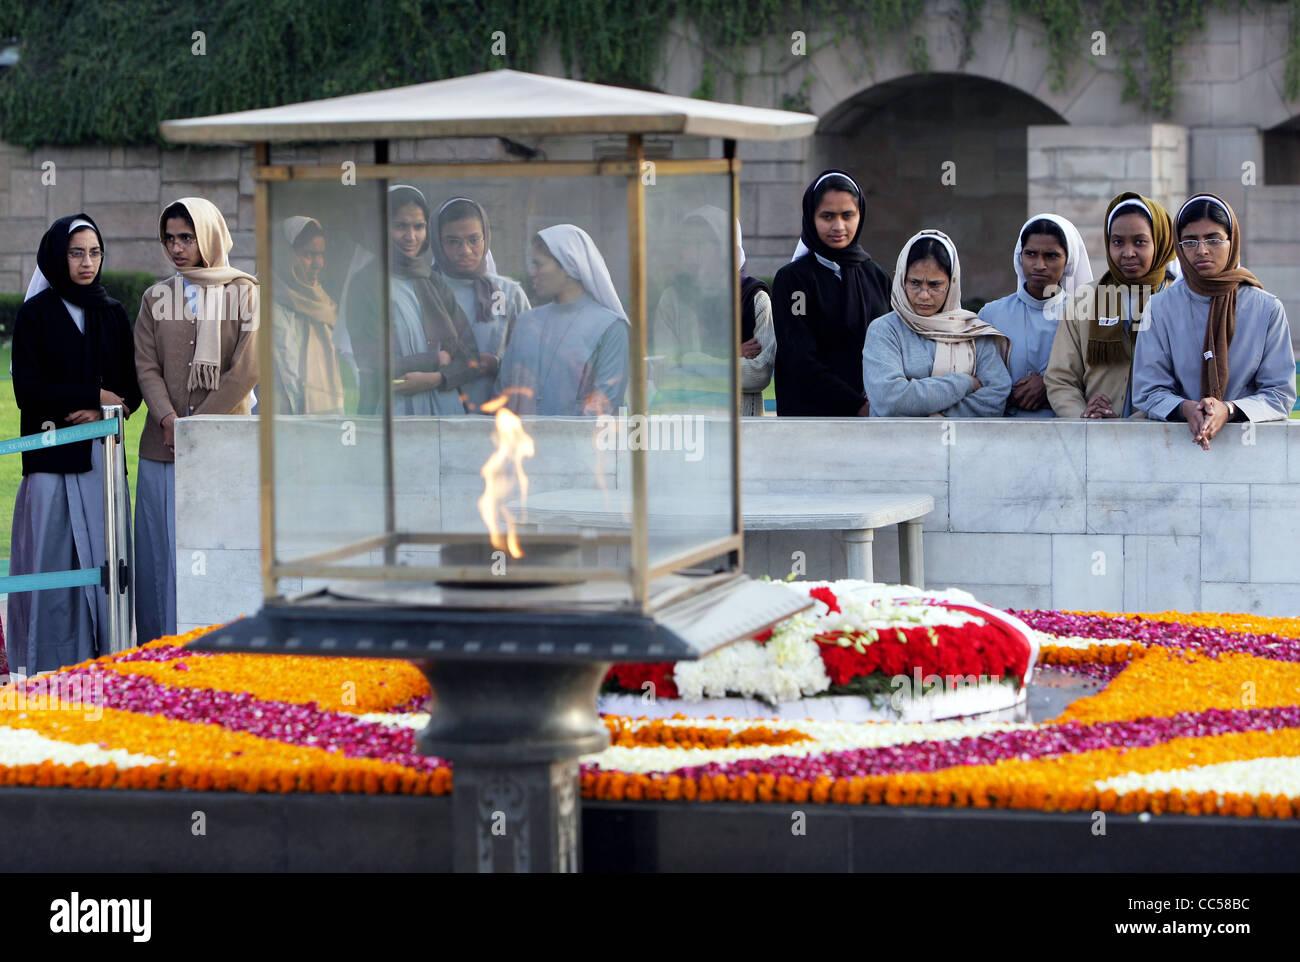 India, New Delhi: Catholic nuns commemorate Mahatma Gandhi at his grave site memorial cremation ghat in New Delhi - Stock Image